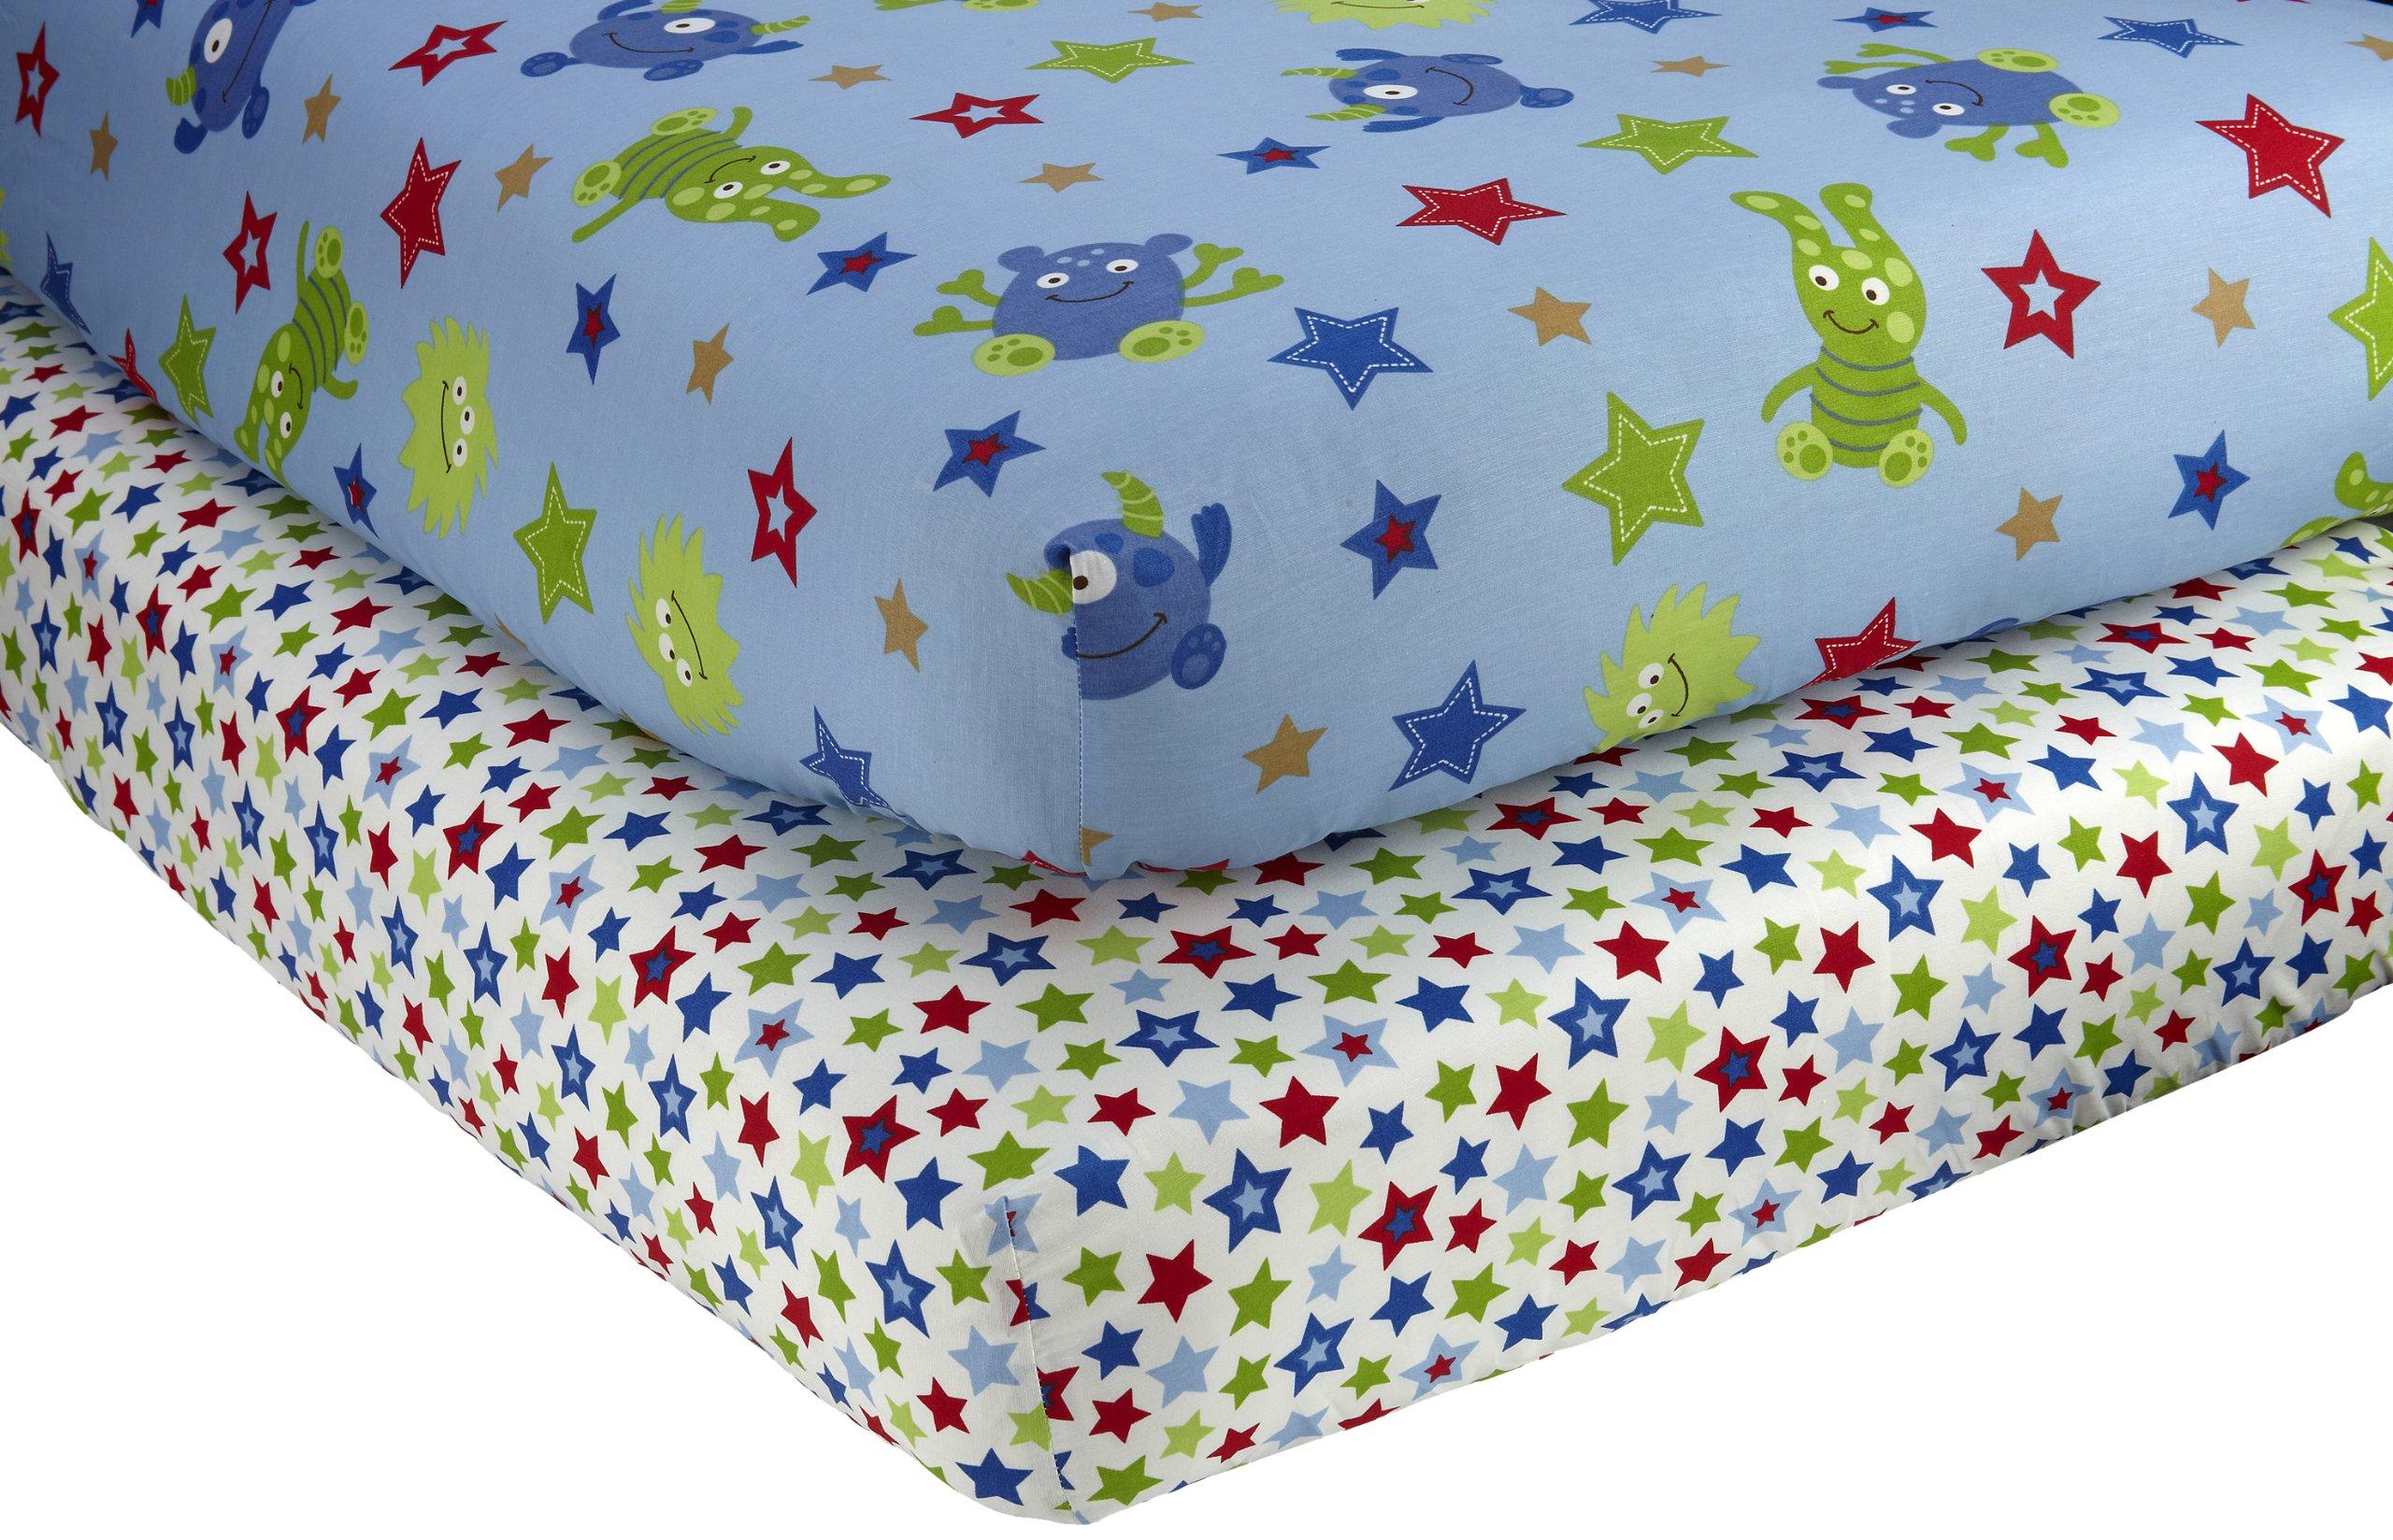 Monsters Inc 4 Piece Premier Crib Bedding Set: Amazon.com : NoJo Little Bedding 2 Count Crib Sheet Set